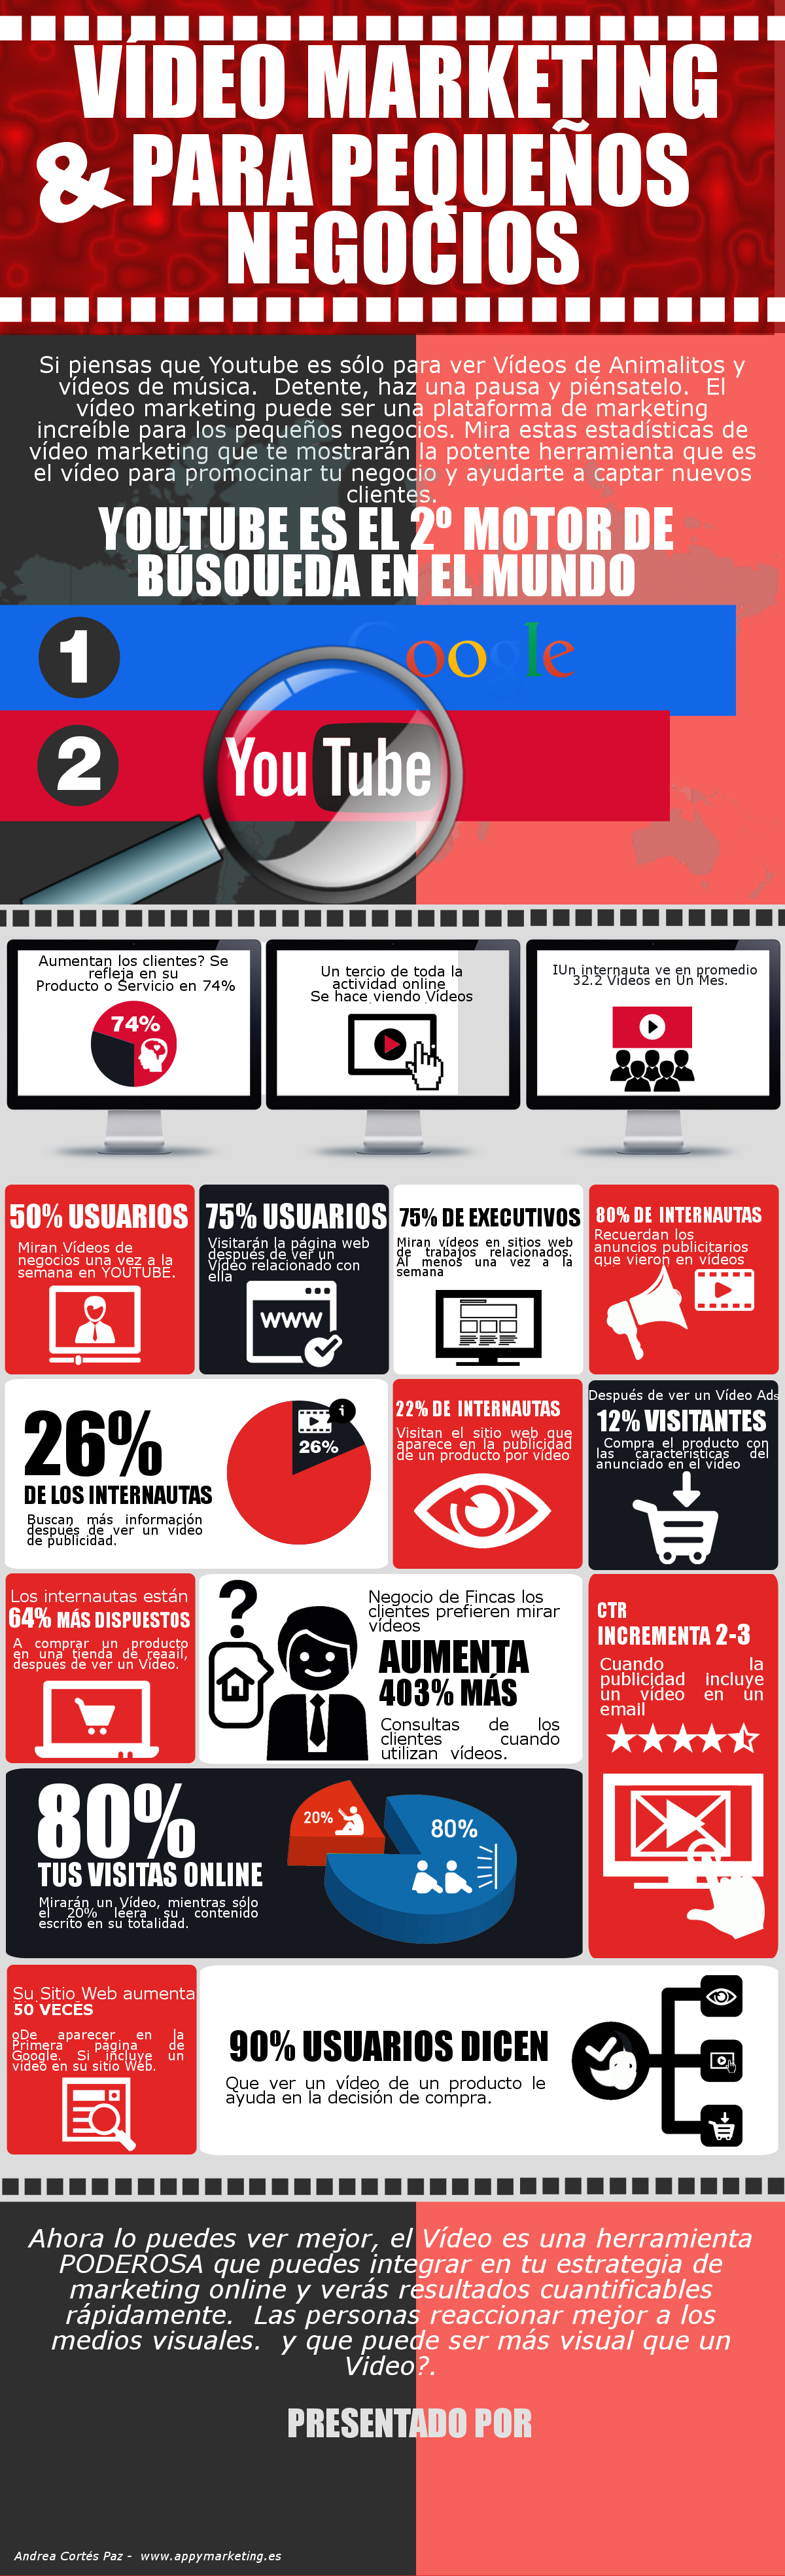 Vídeo marketing para pymes #infografia #infographic #marketing